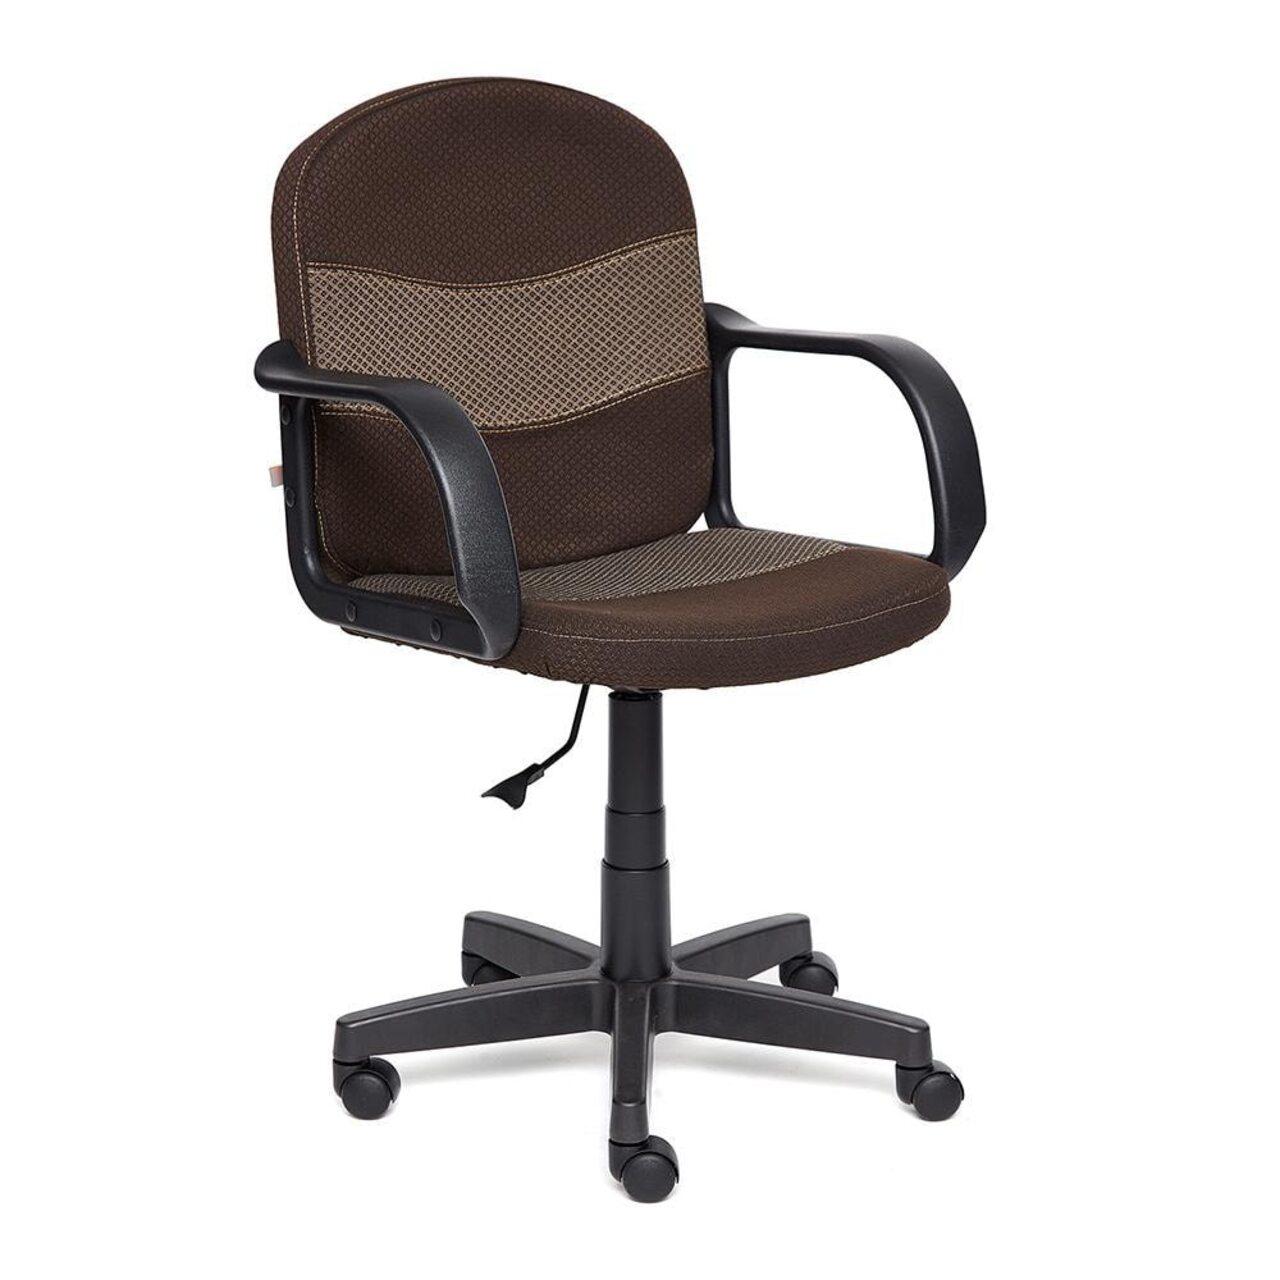 Кресло для персонала BAGGI (ткань) - фото 6